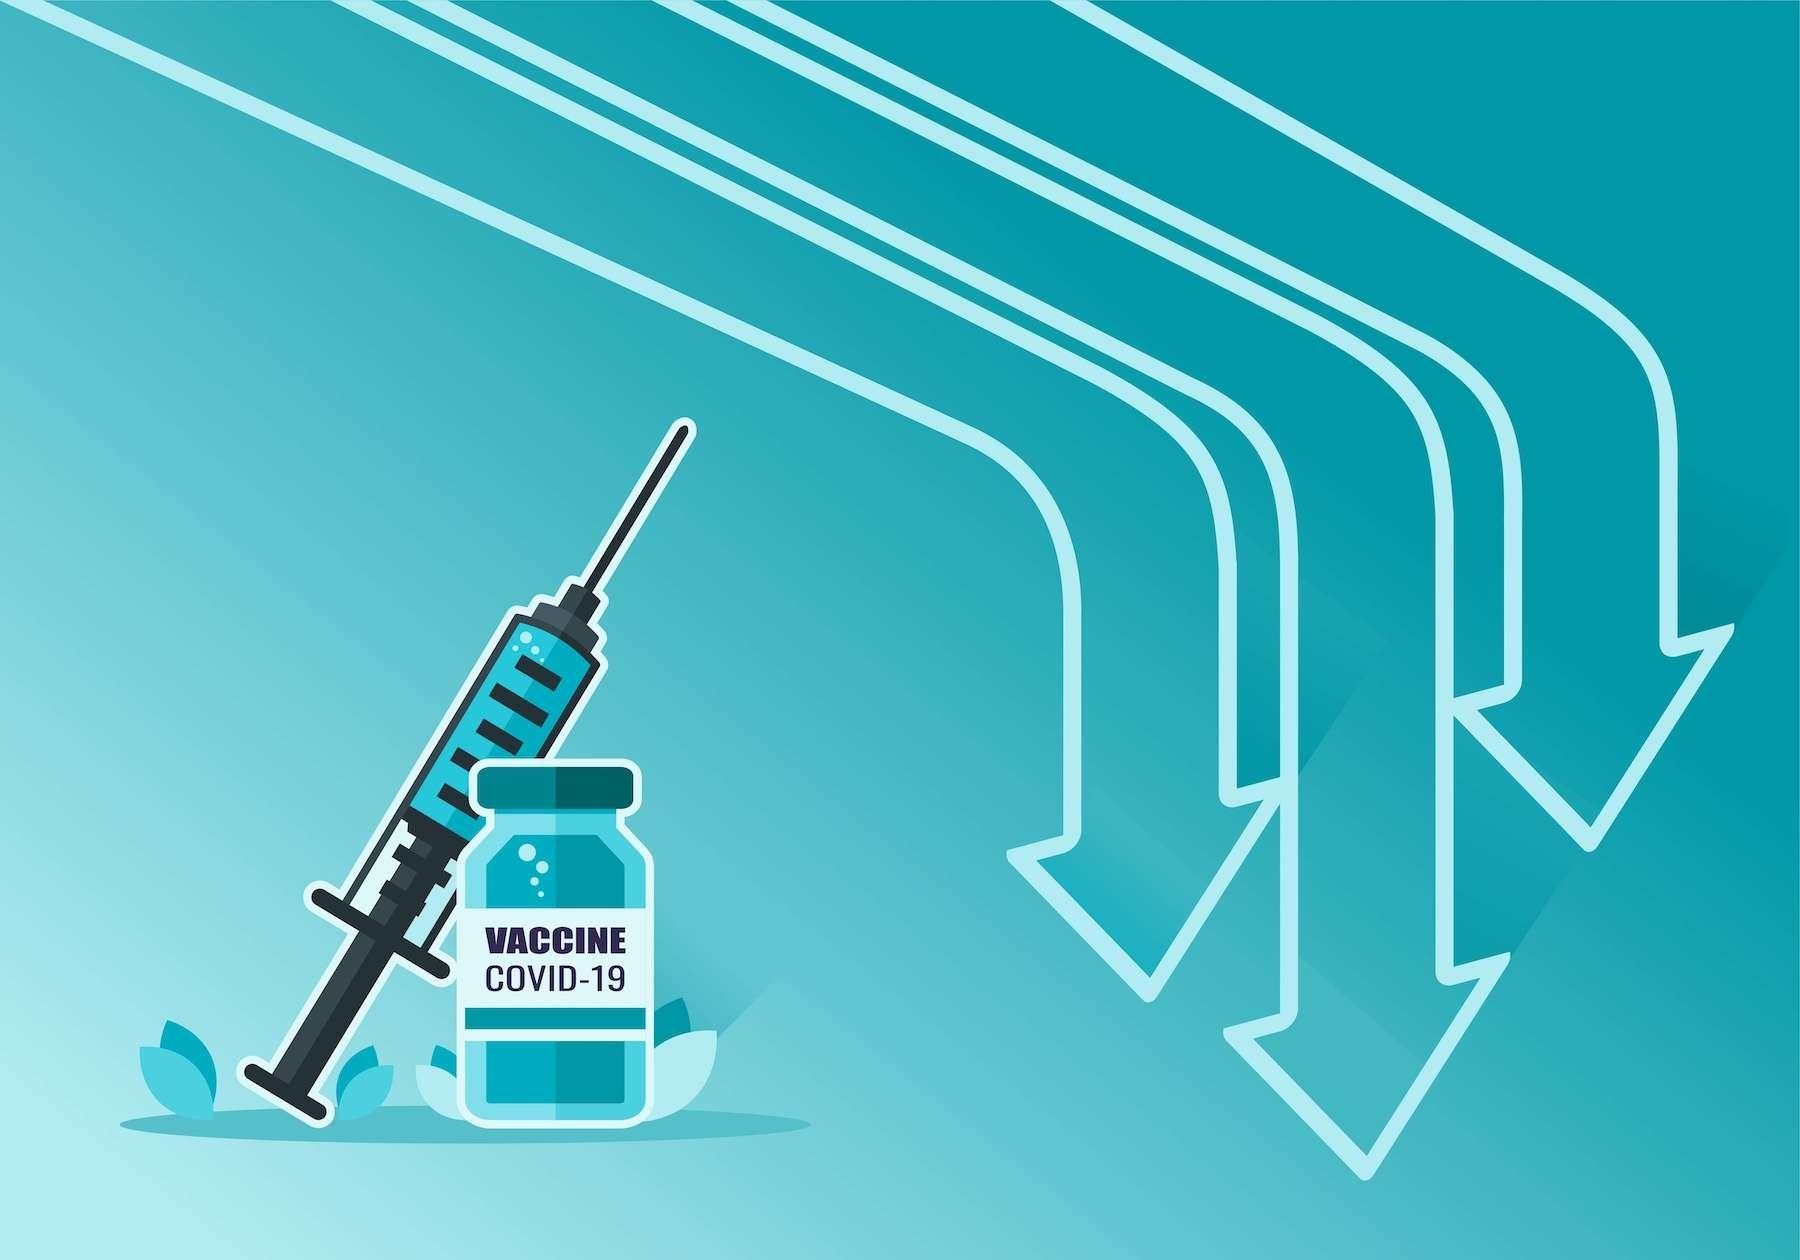 L'efficacité des vaccins diminue progressivement au fil du temps. Mais jusqu'où ? © Menara Grafis, Adobe Stock